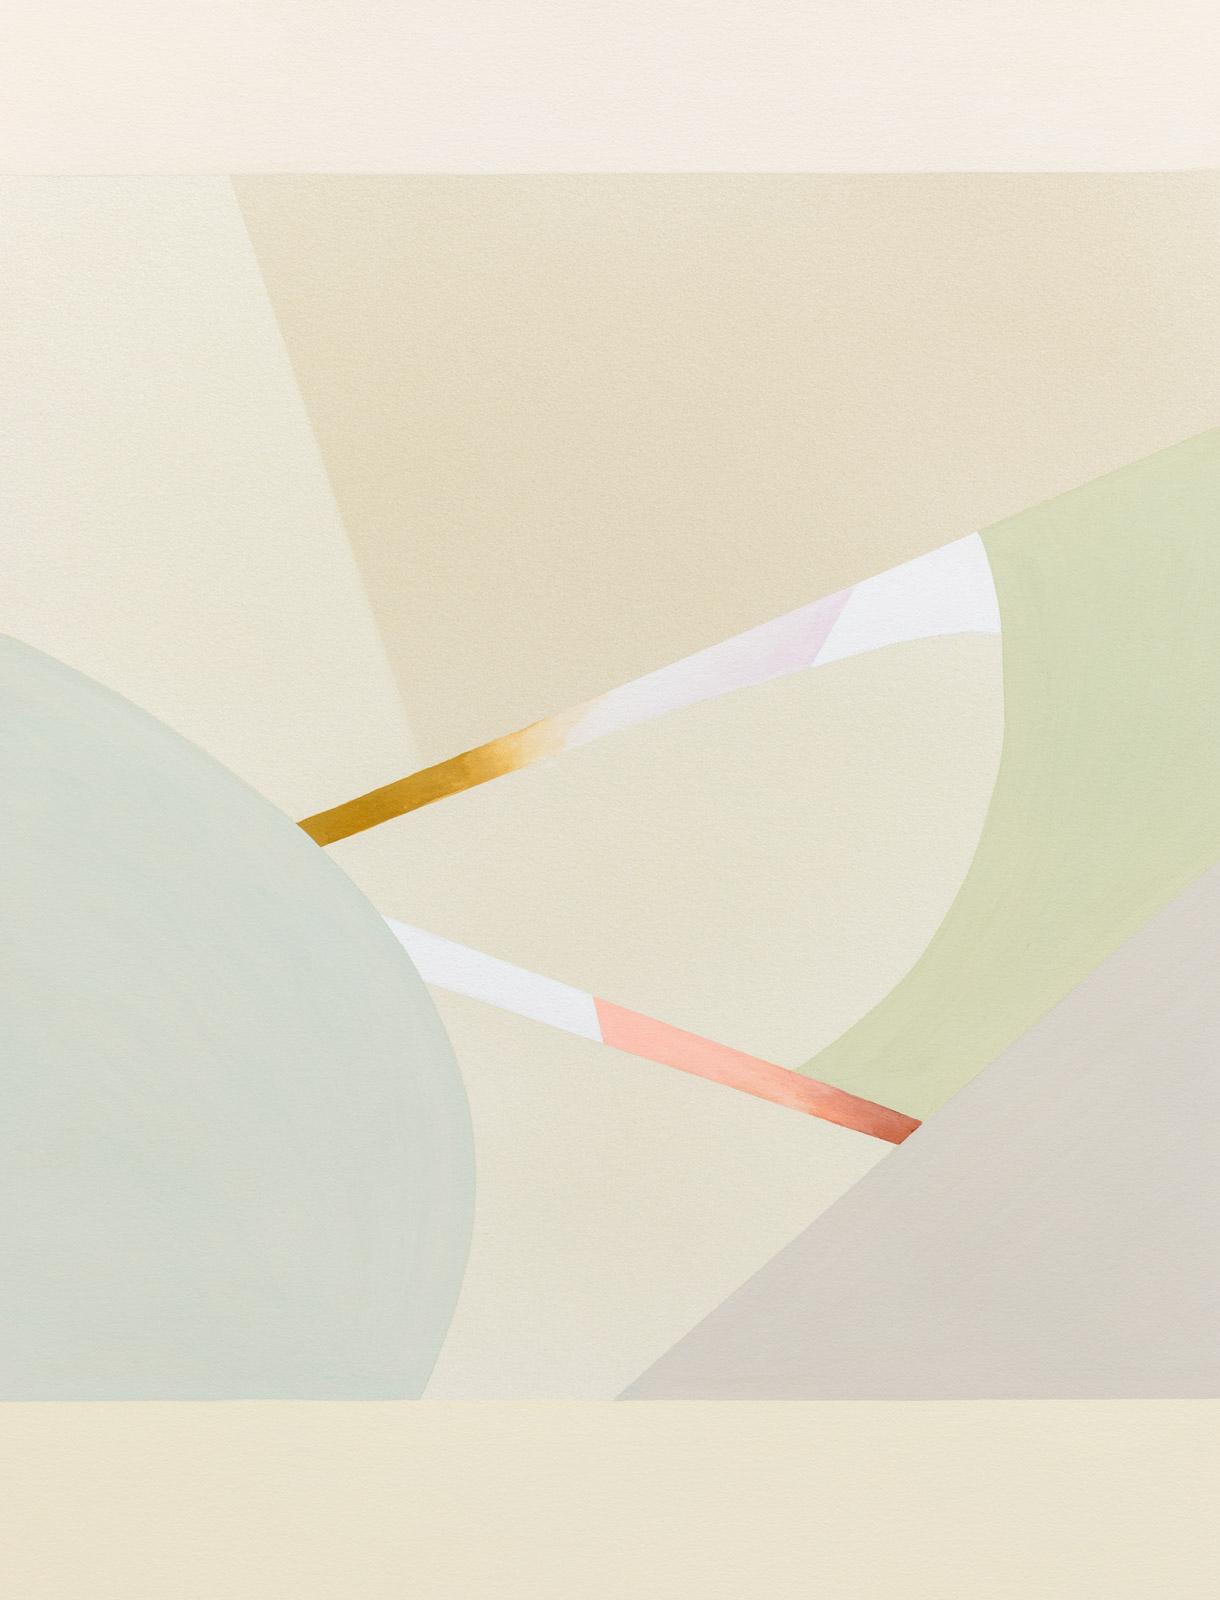 Lightcurves VIII, 2020, Watercolor and casein tempera on 640 gsm Arches Grain Torchon paper, 92 x 70 cm, Unique